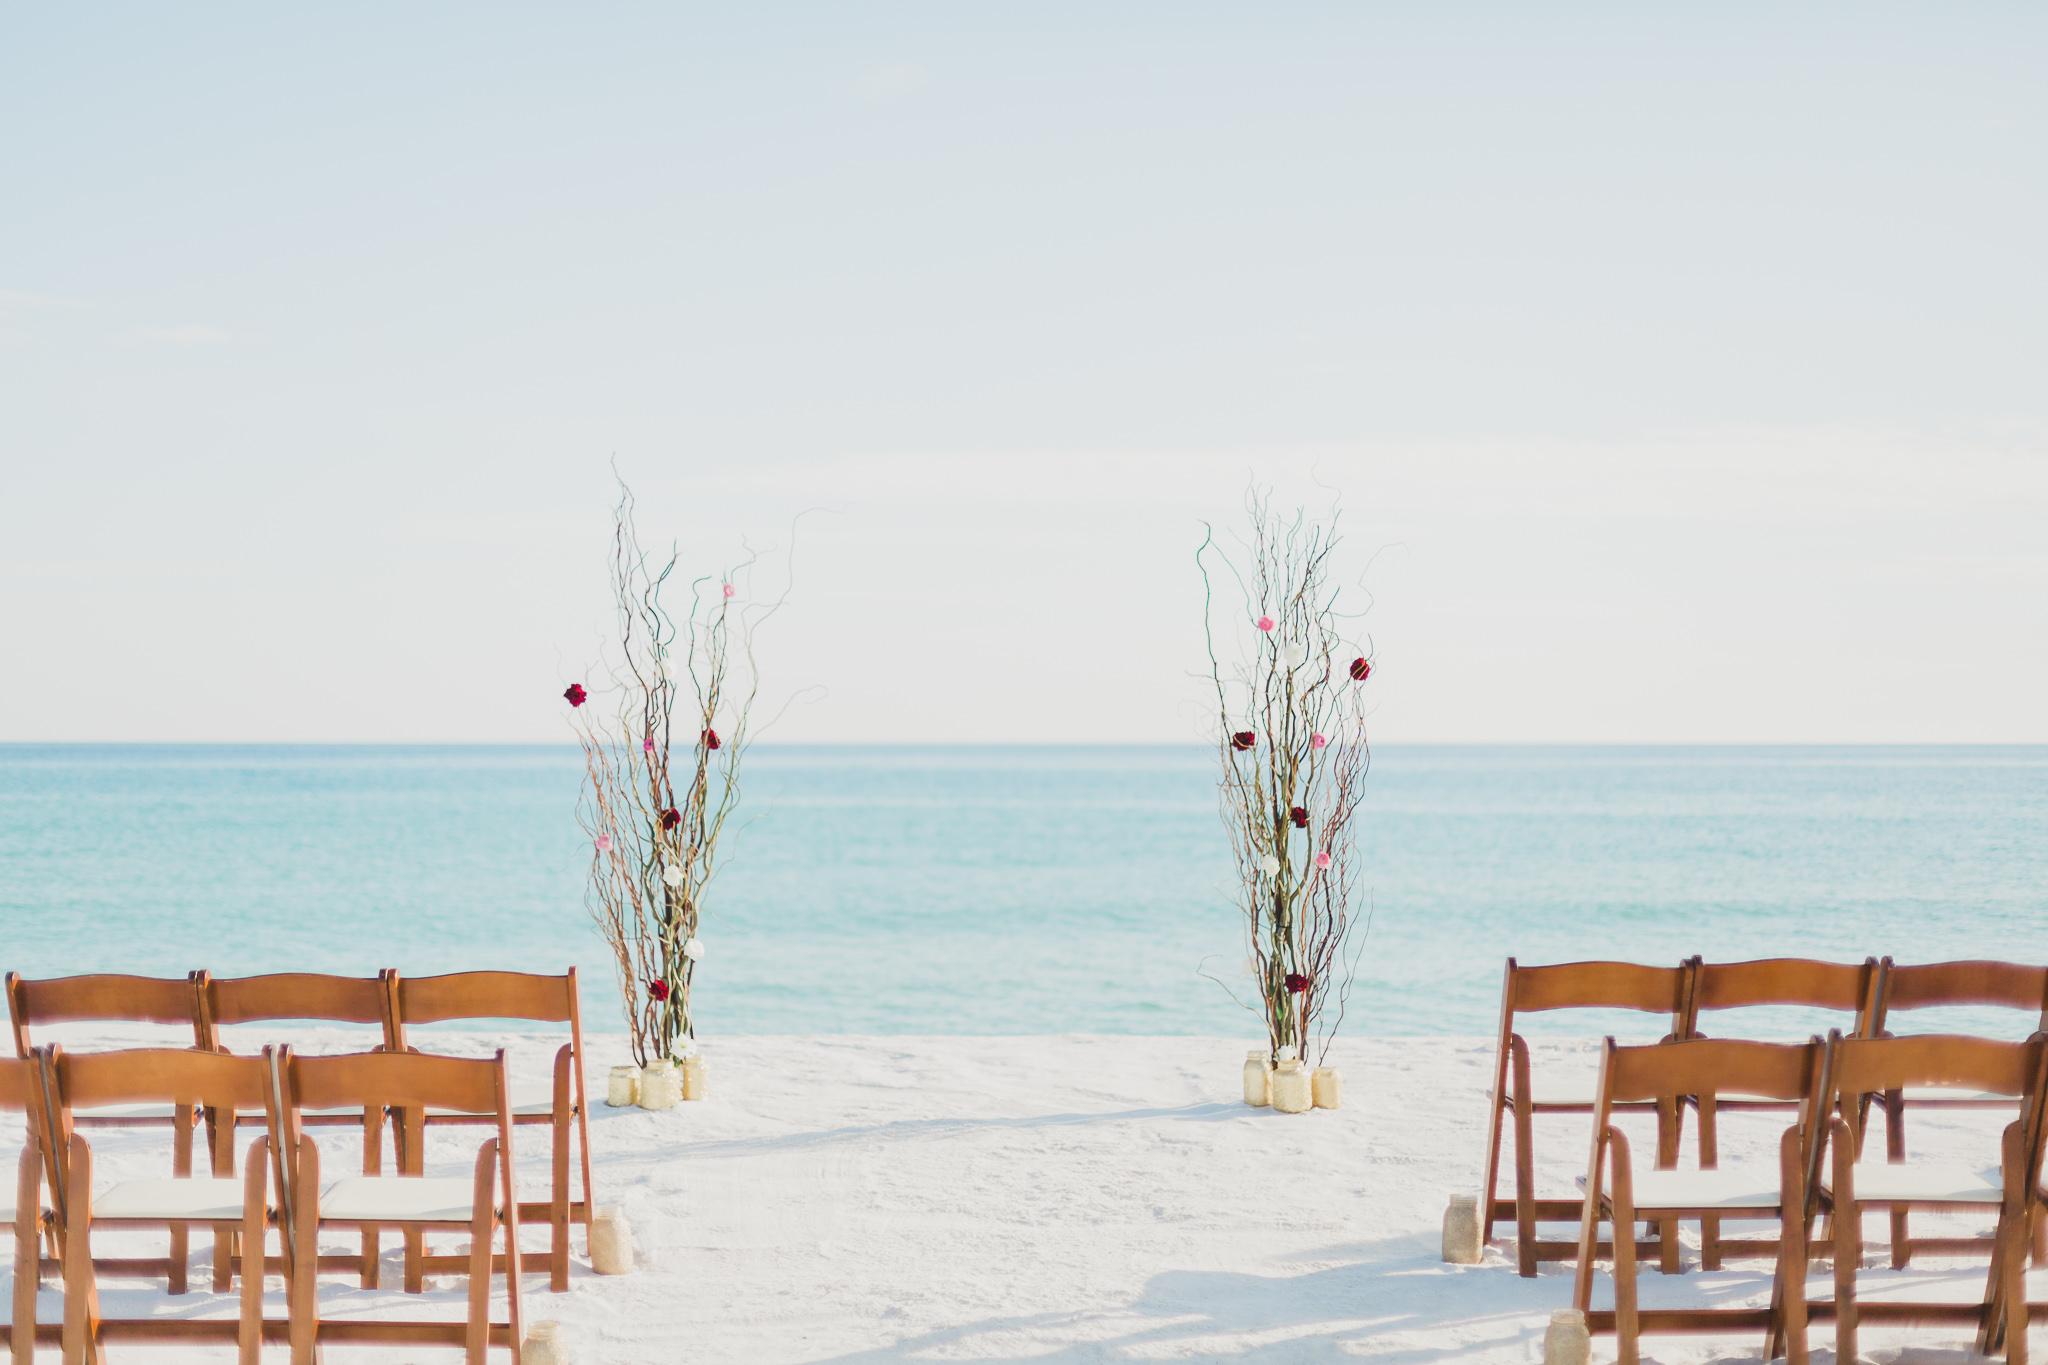 pensacola beach serene occasions arbor for beach wedding